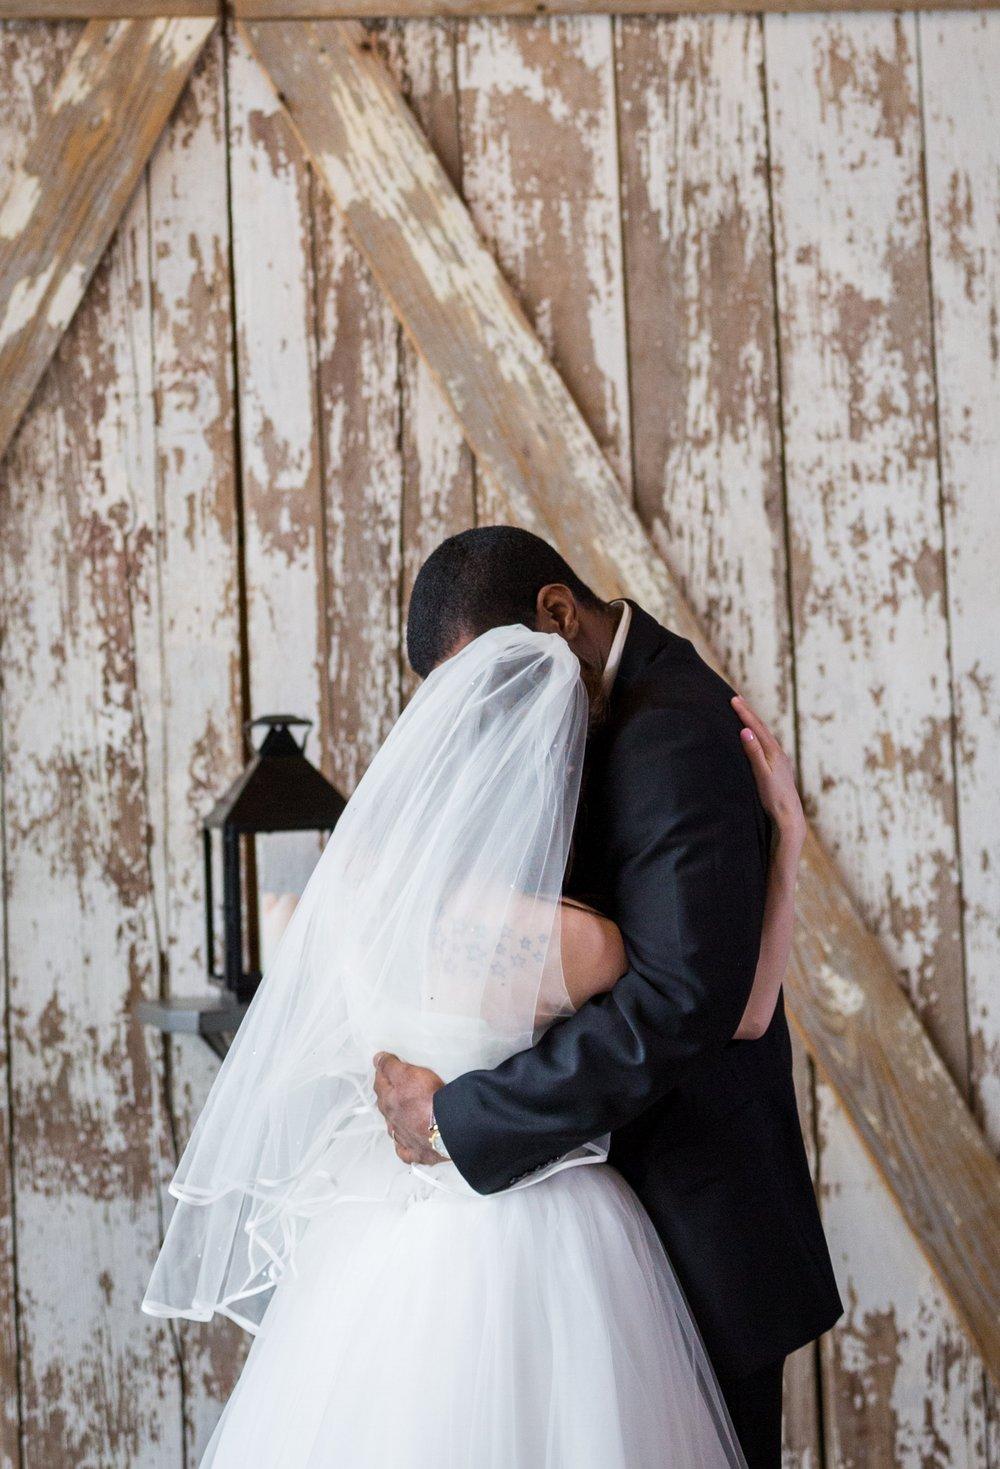 Kansas_City_Small_Wedding_Venue_Elope_Intimate_Ceremony_Budget_Affordable_15MinWedding-094.jpg